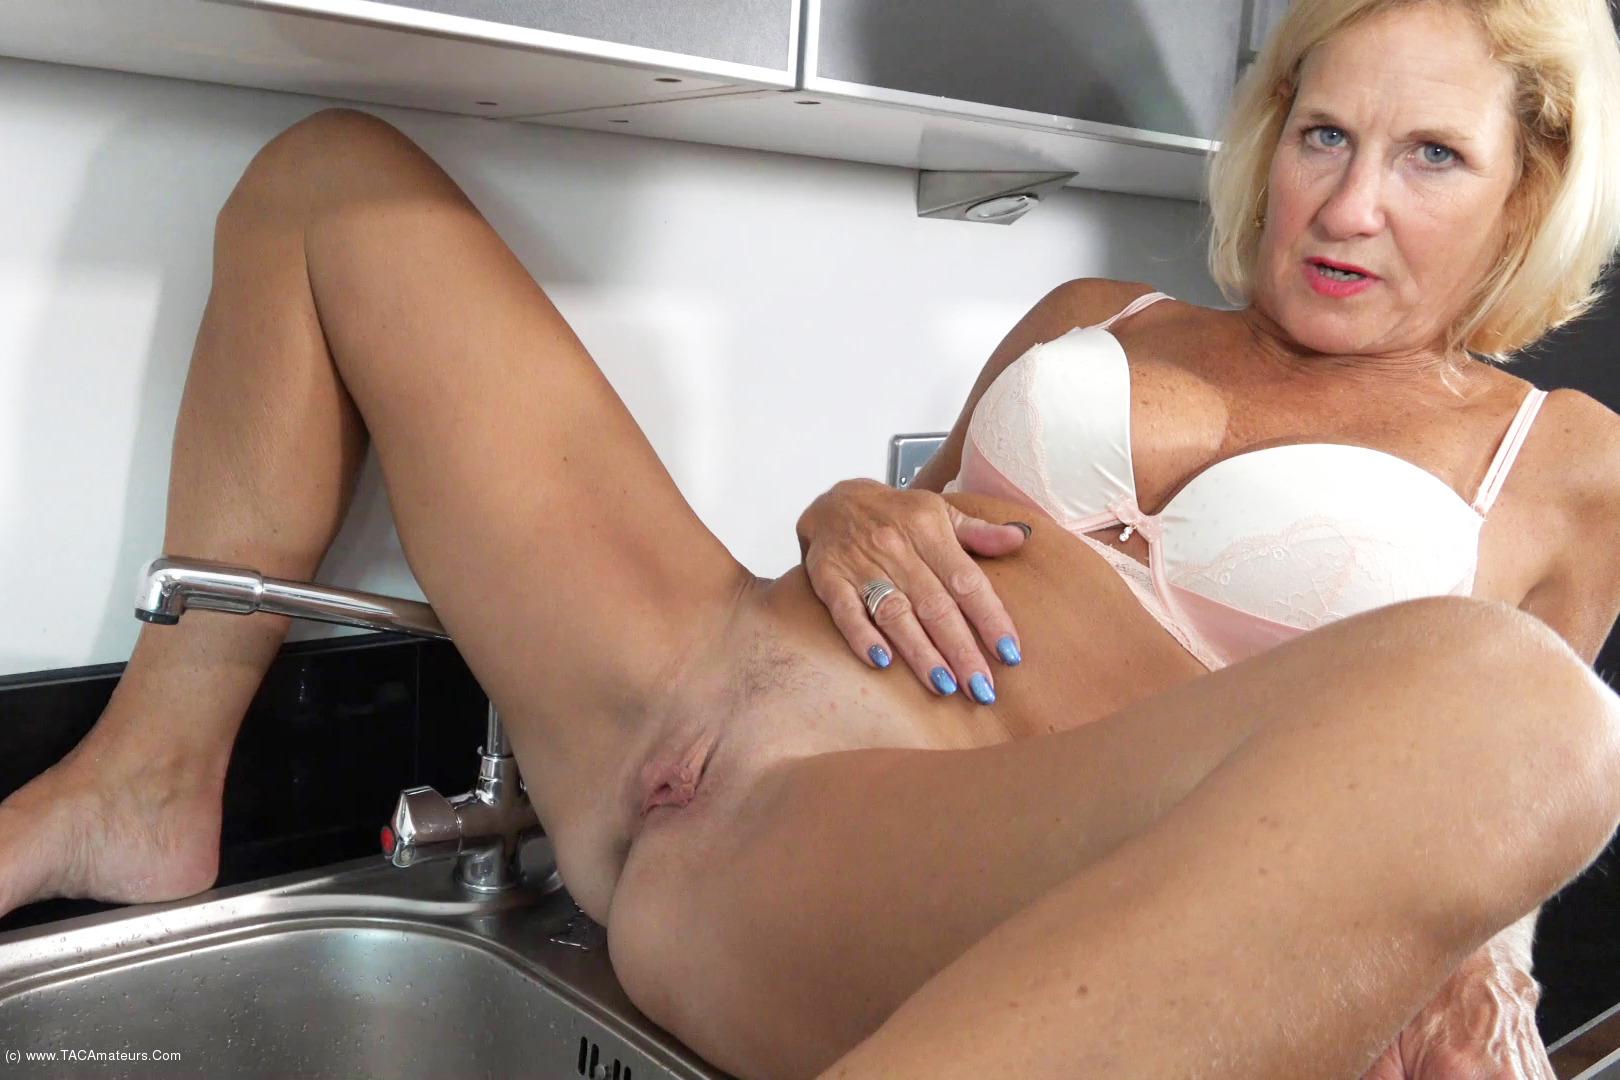 MollyMILF - Pissing In The Sink scene 0